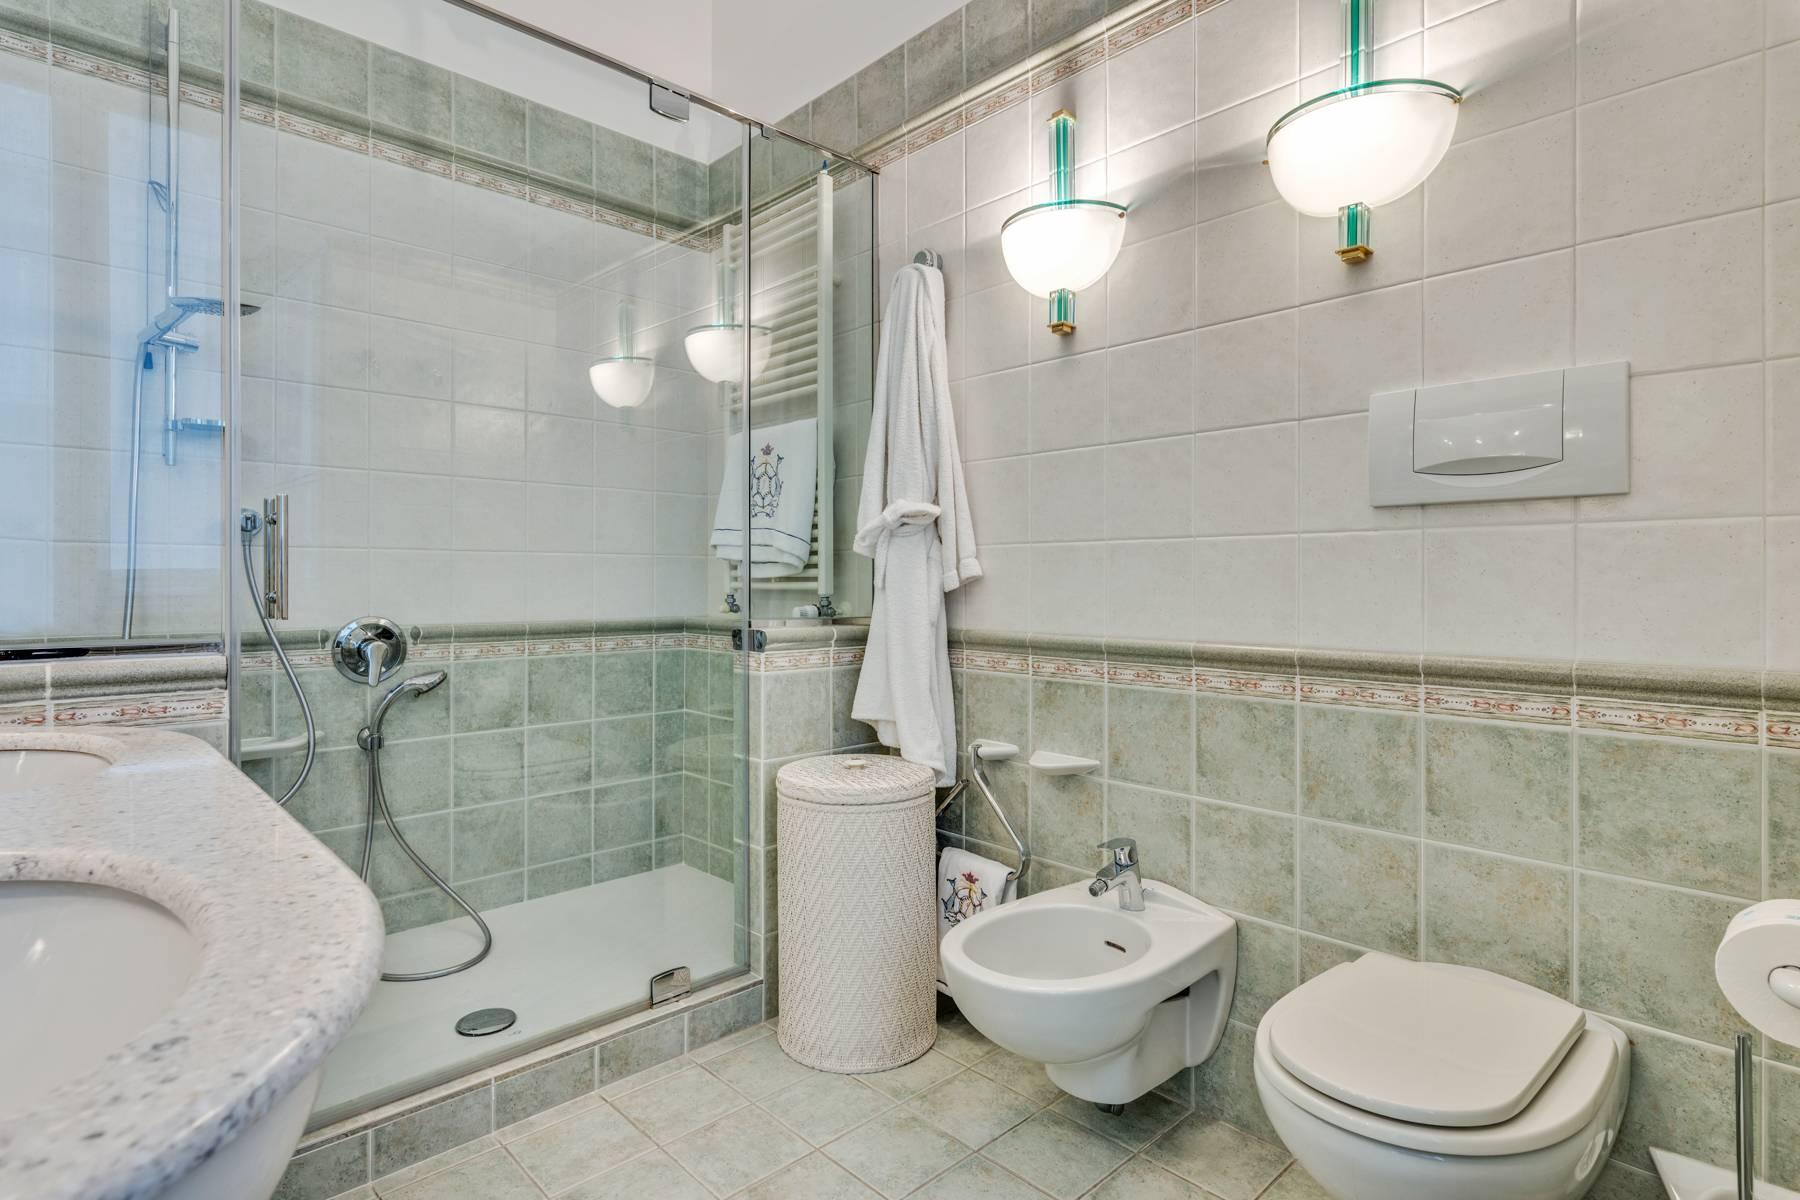 Prestigious 275 sqm apartment inside a period building in Carignano - 24